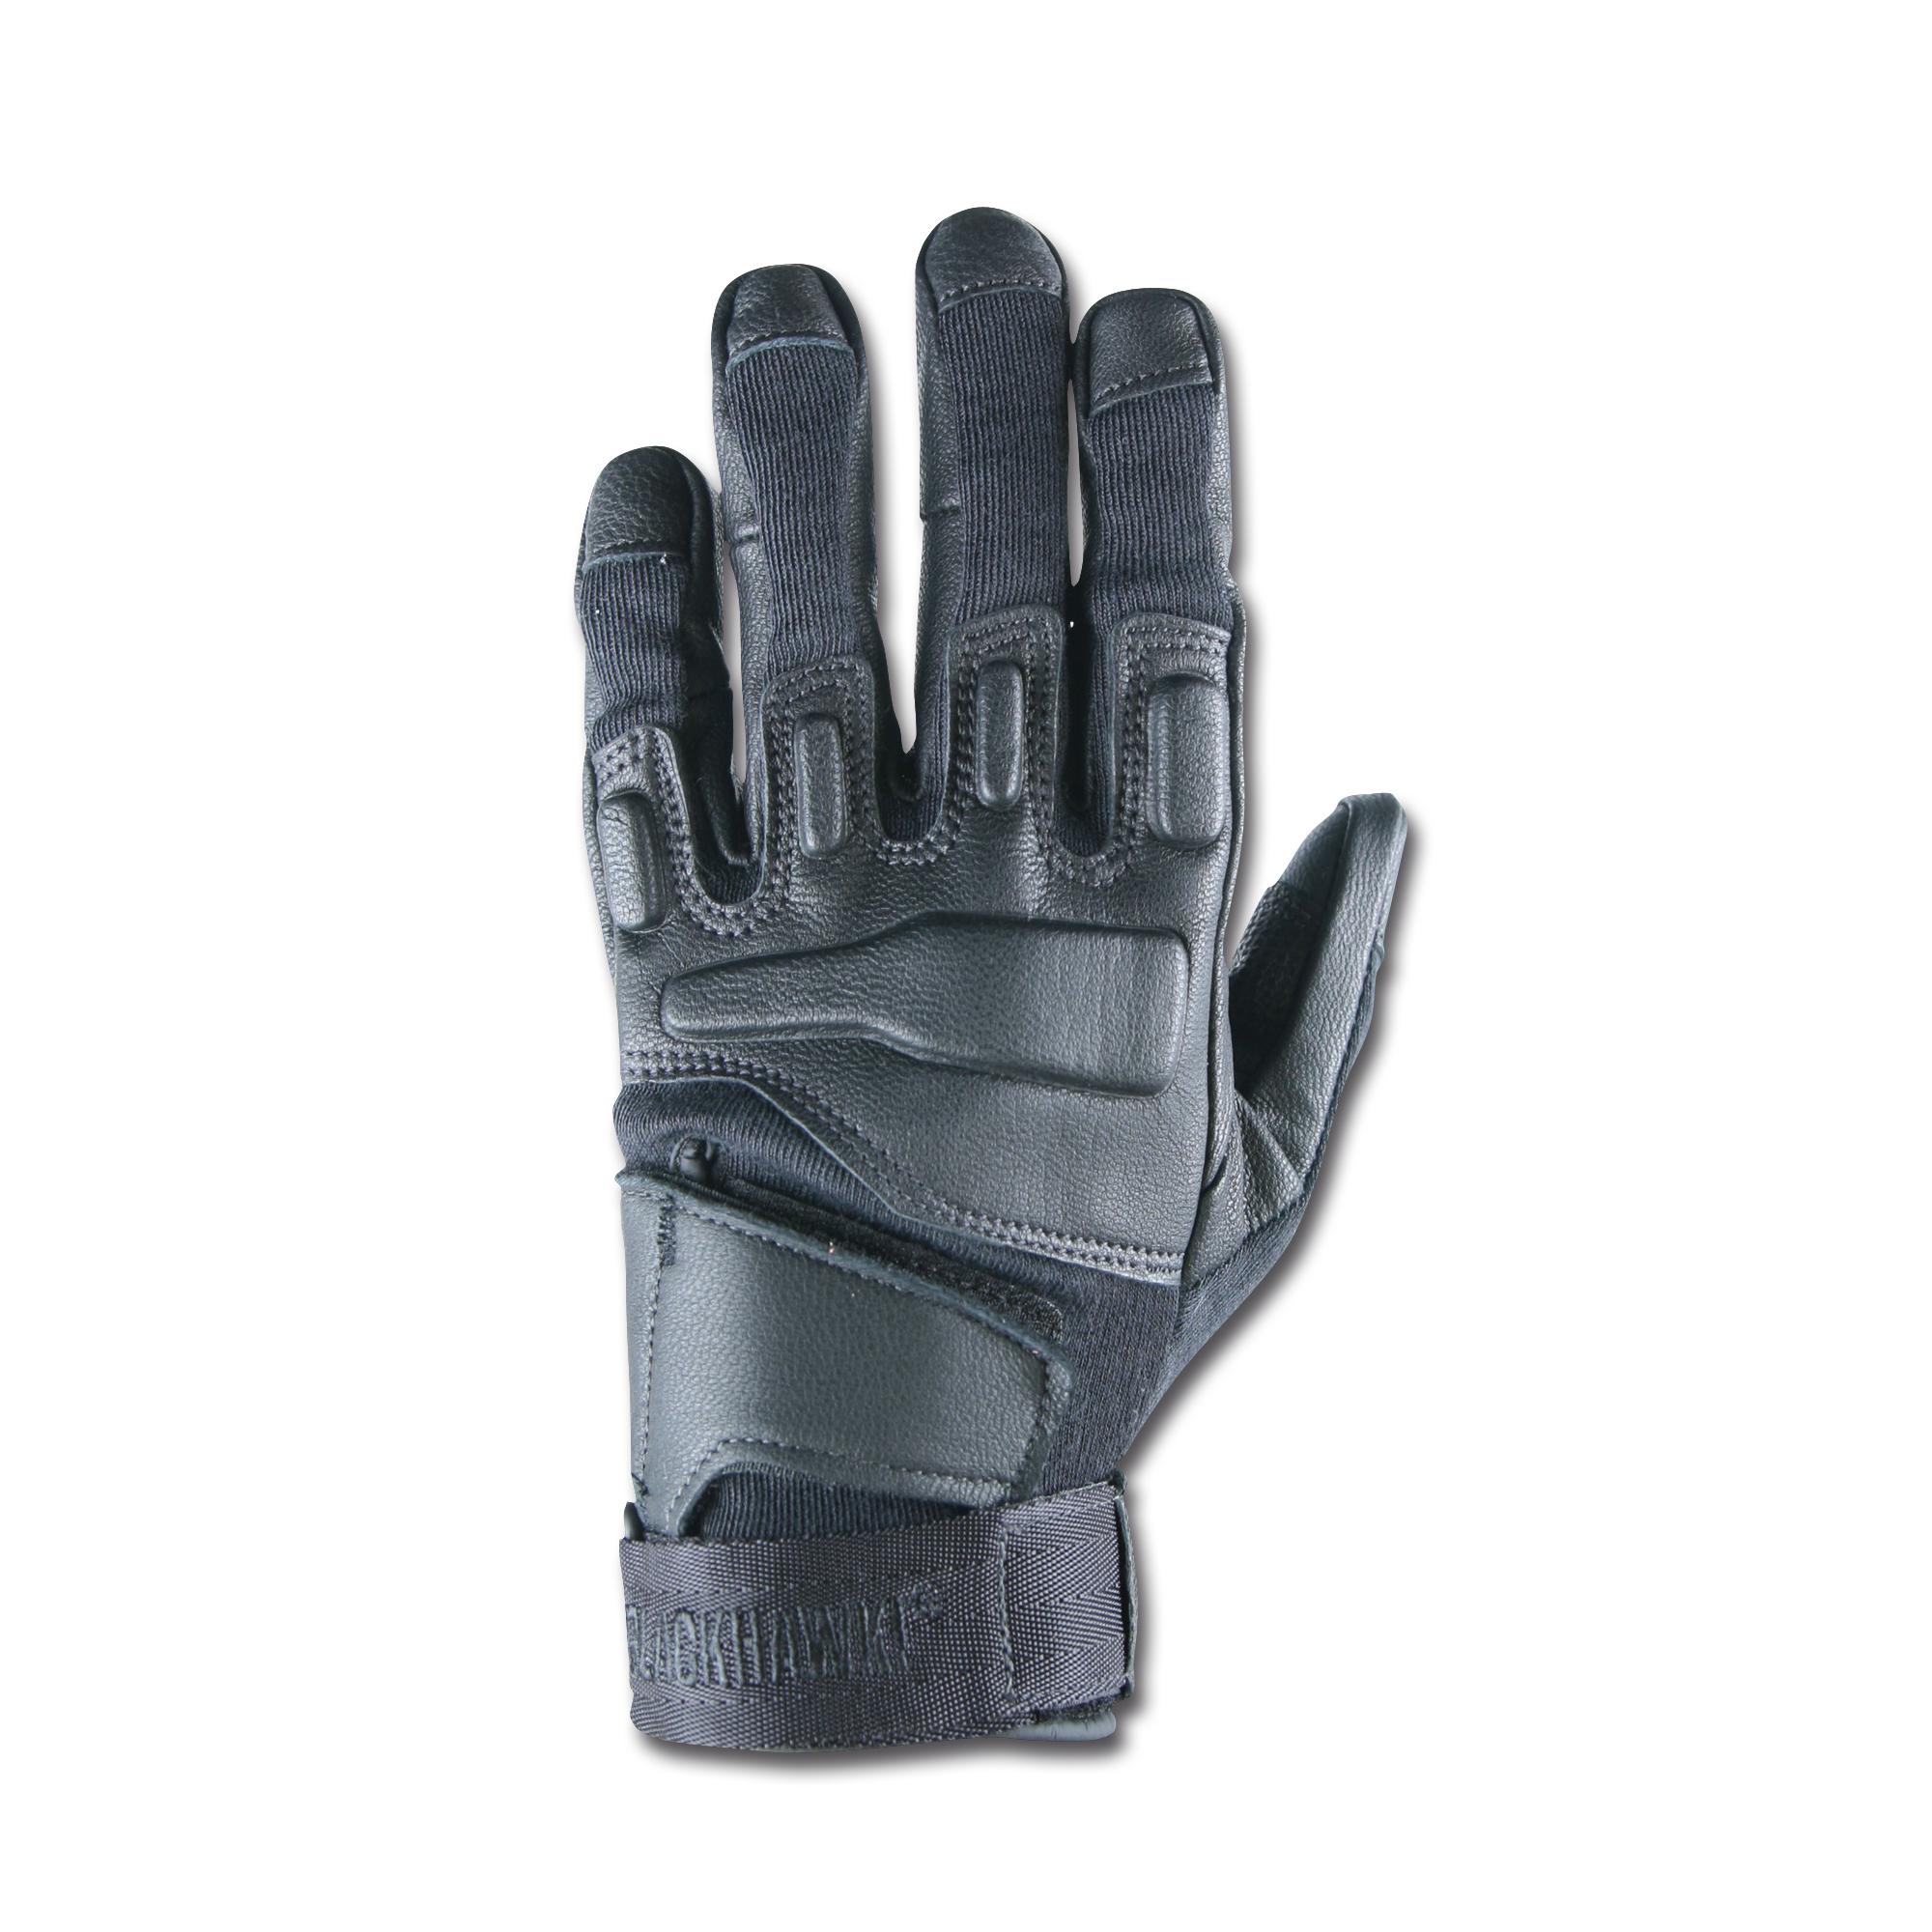 Blackhawk Gloves S.O.L.A.G. Kevlar